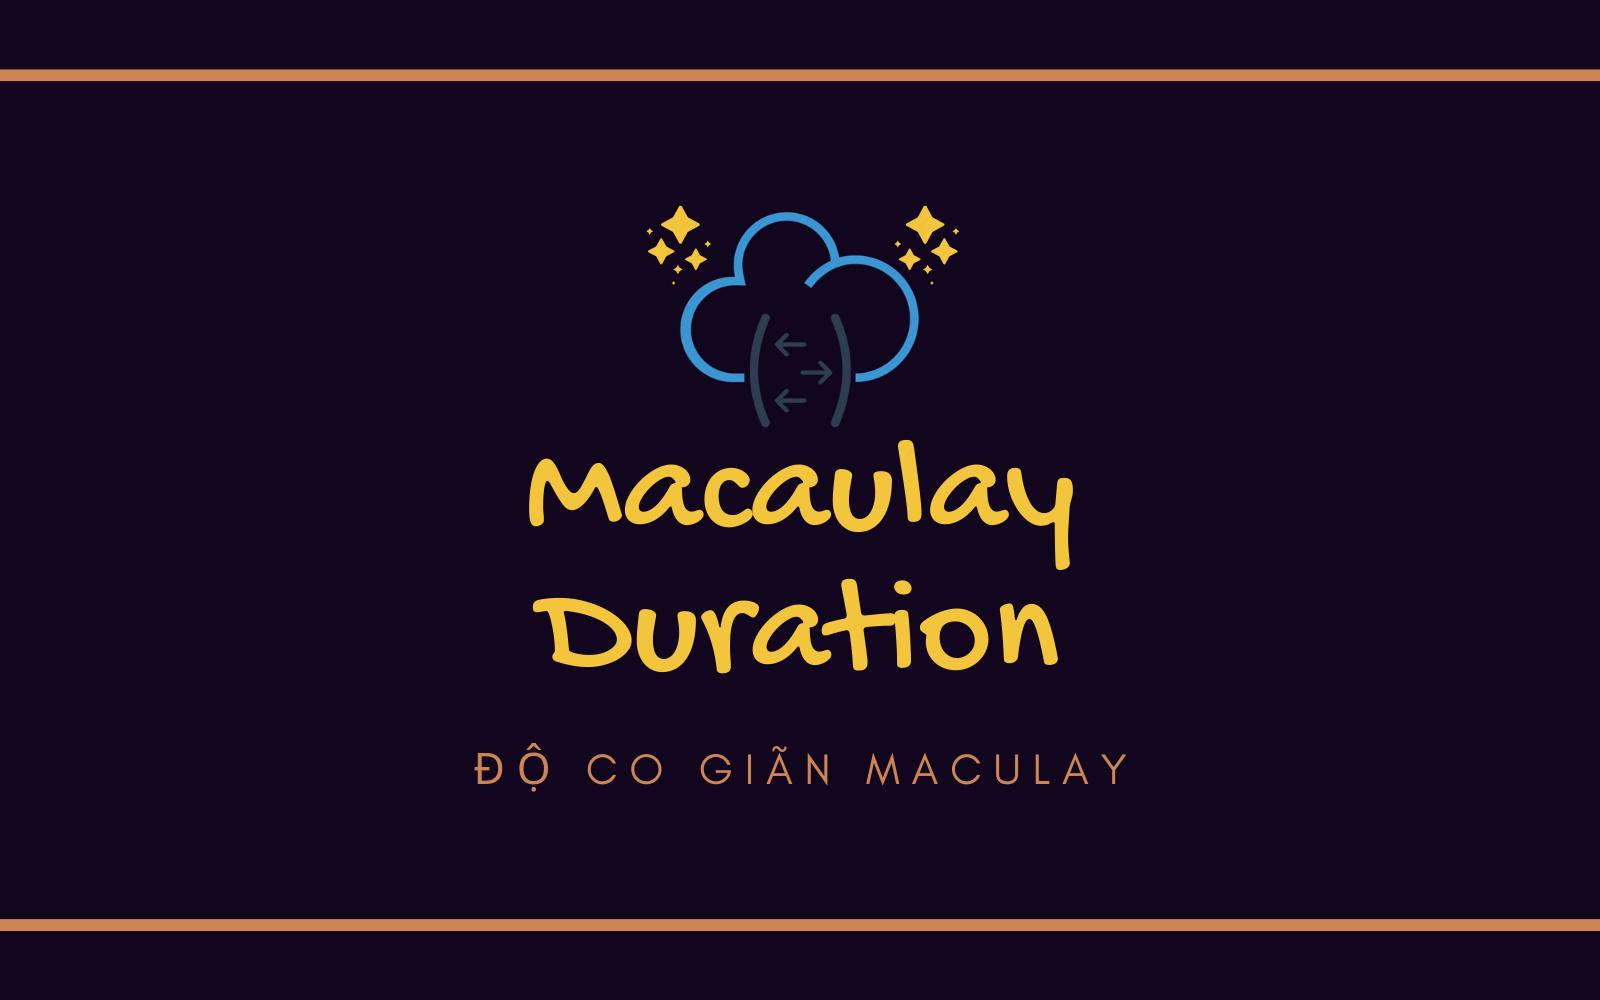 Macaulay Duration